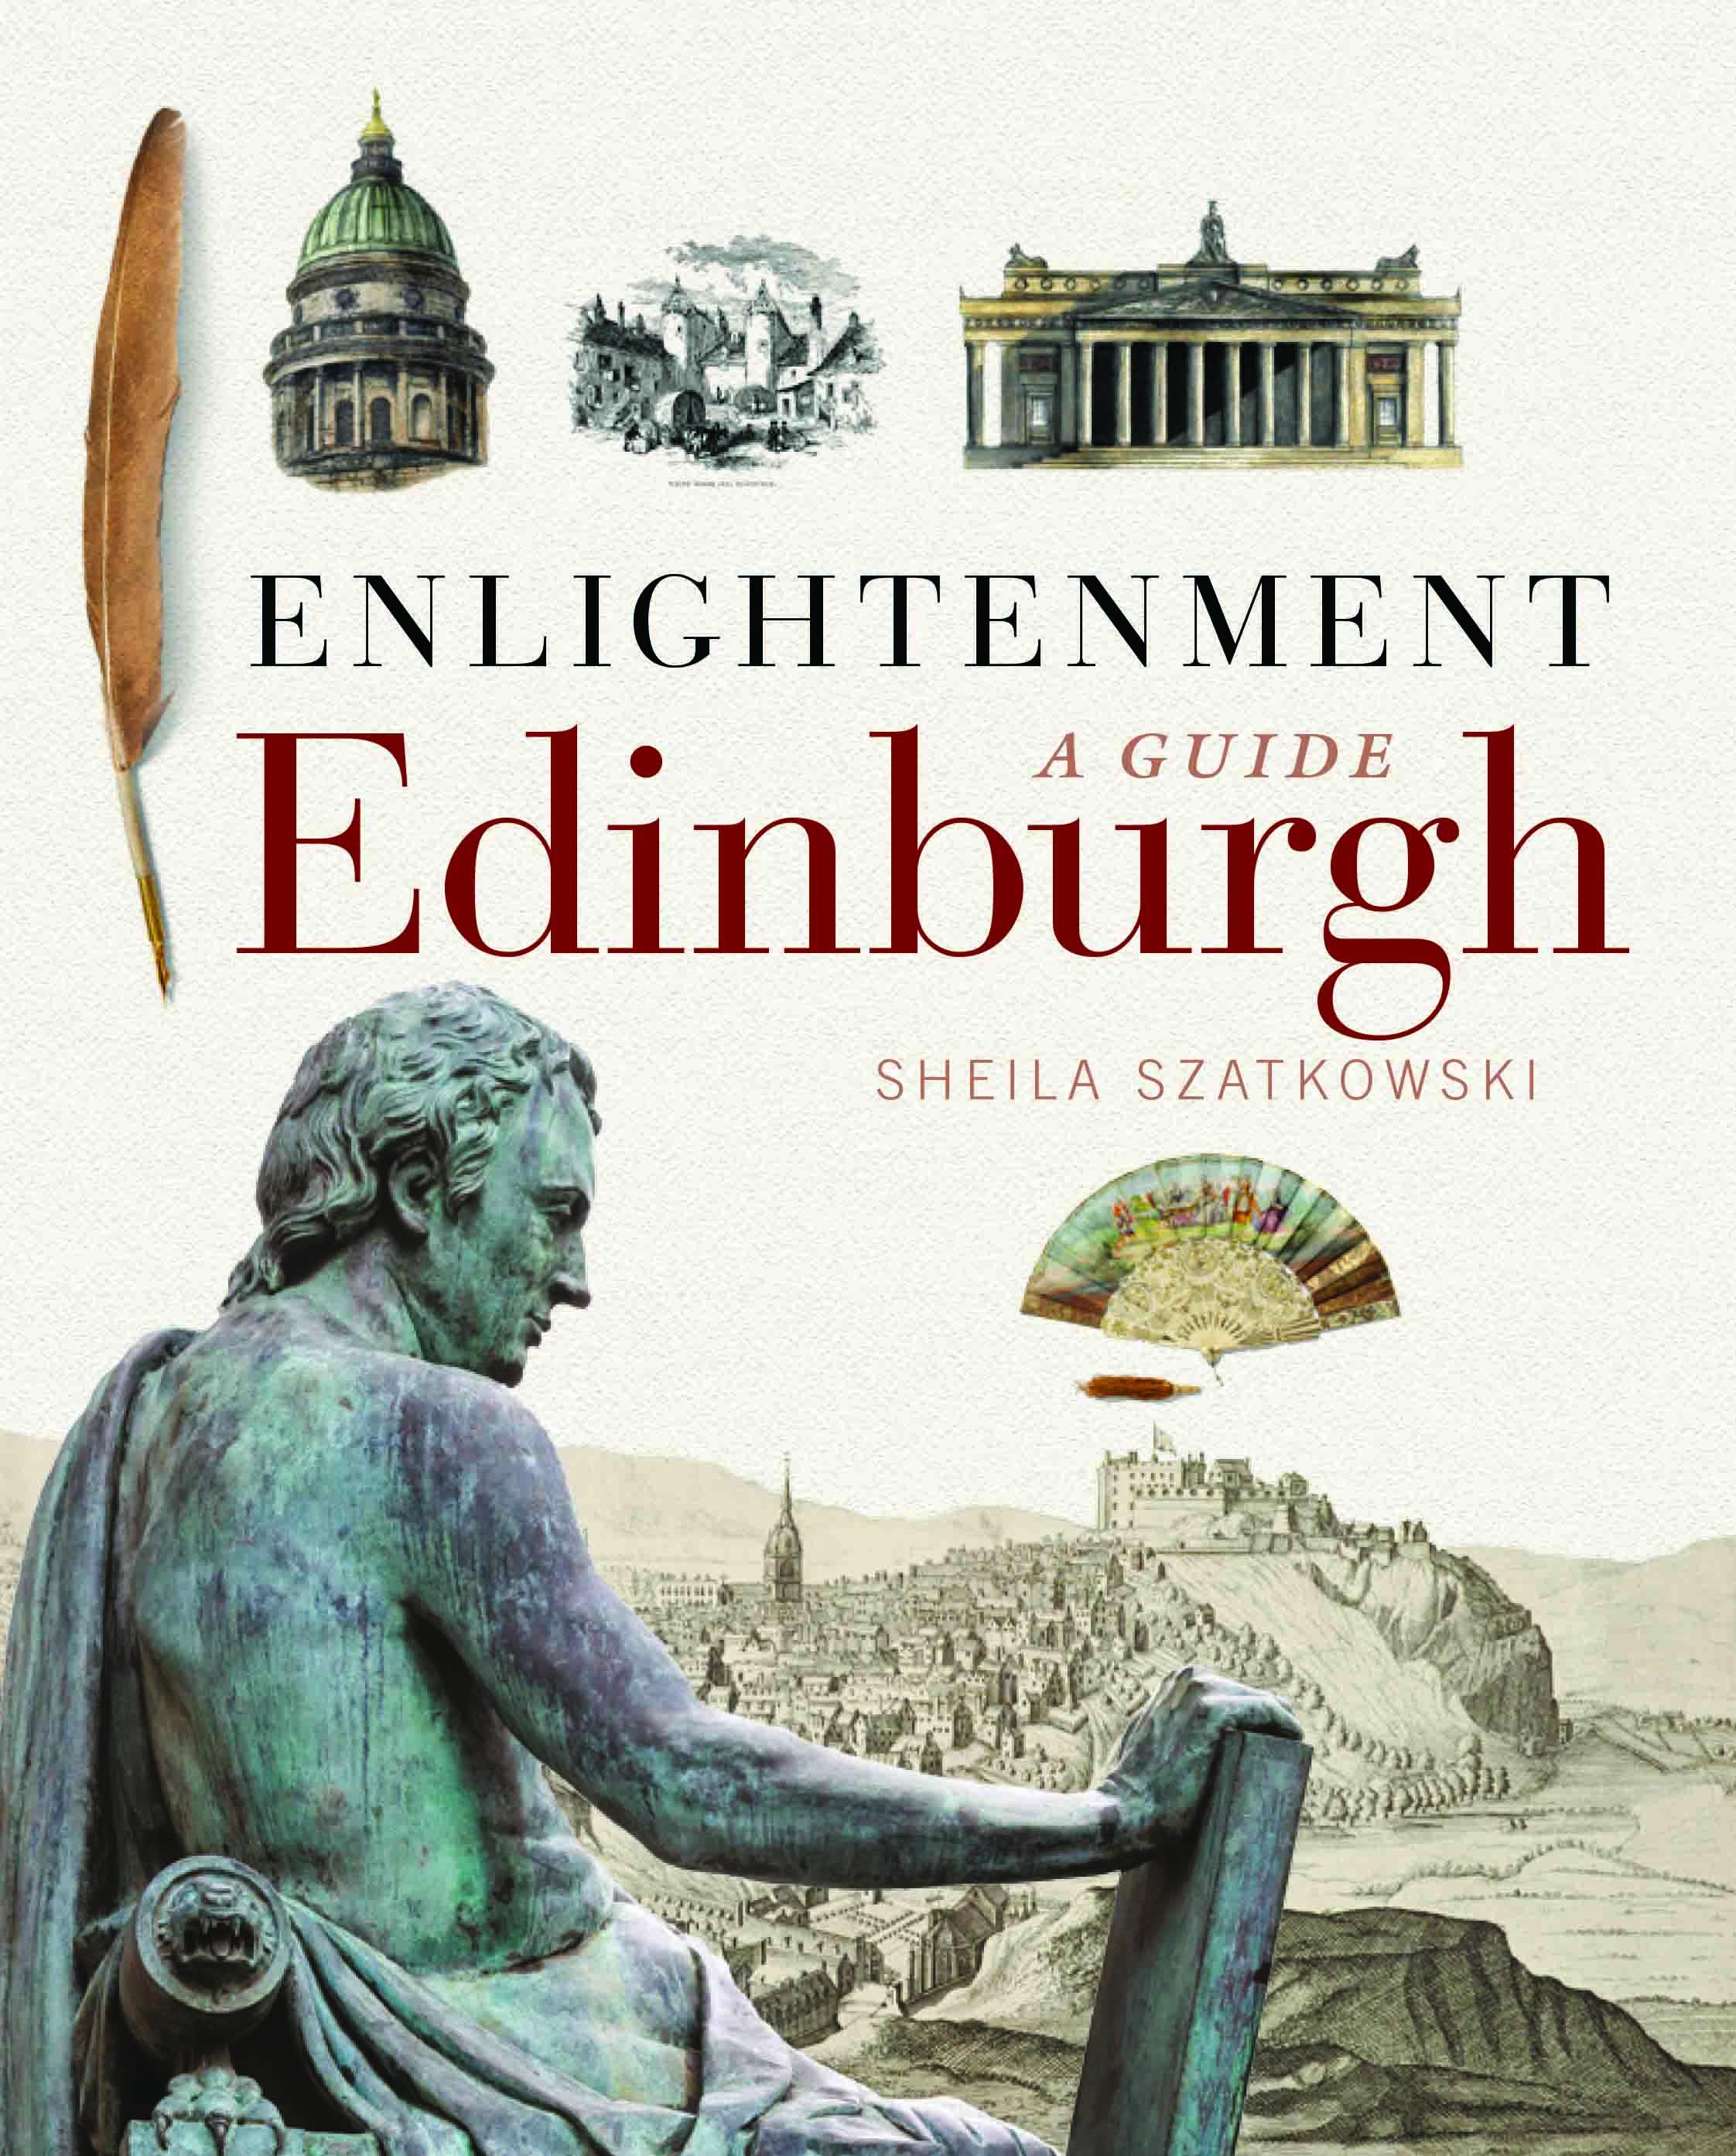 Enlightenment Edinburgh: A guide book cover